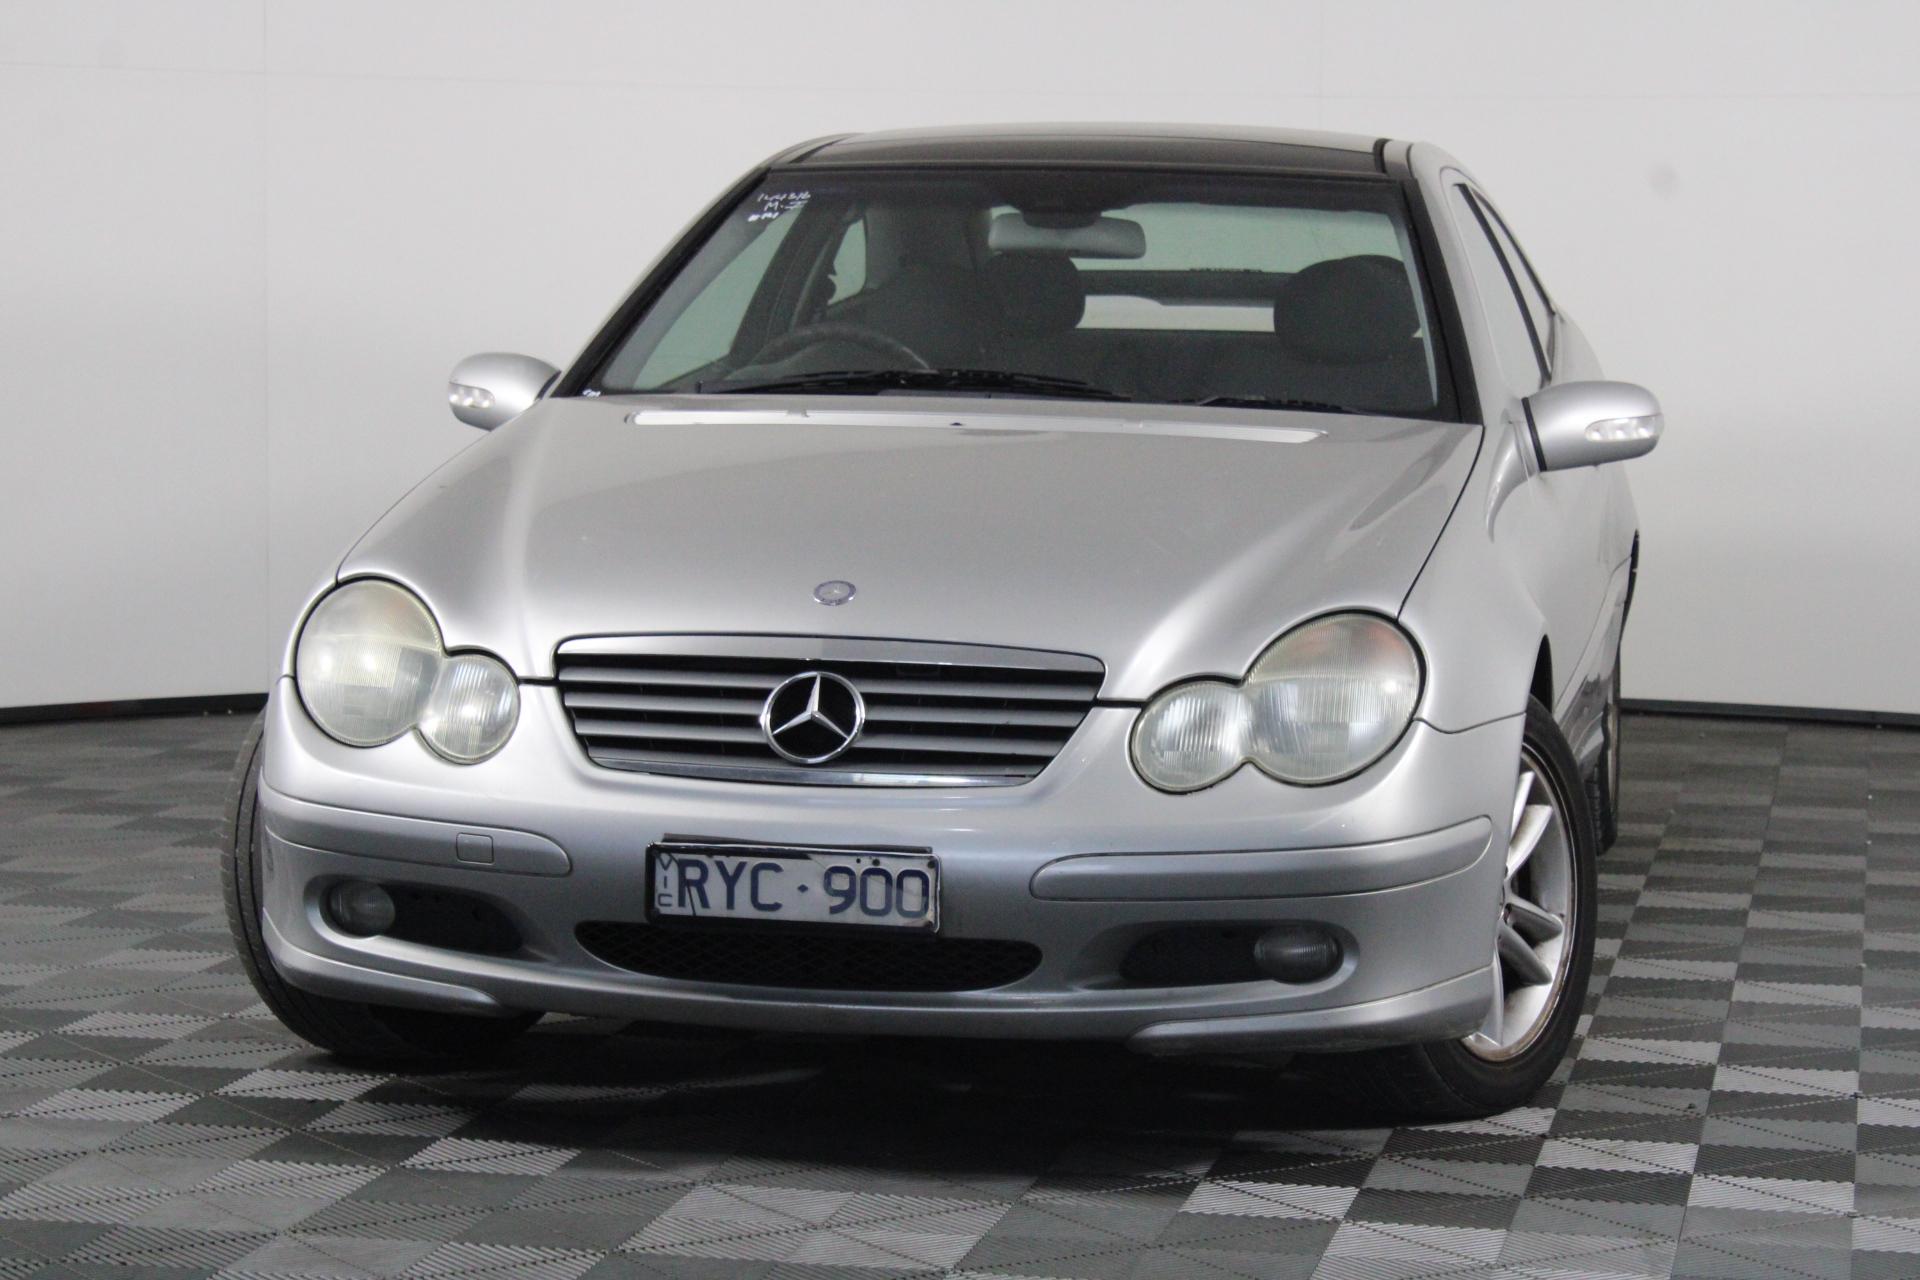 2002 Mercedes Benz C180 Kompressor CL203 Automatic Coupe